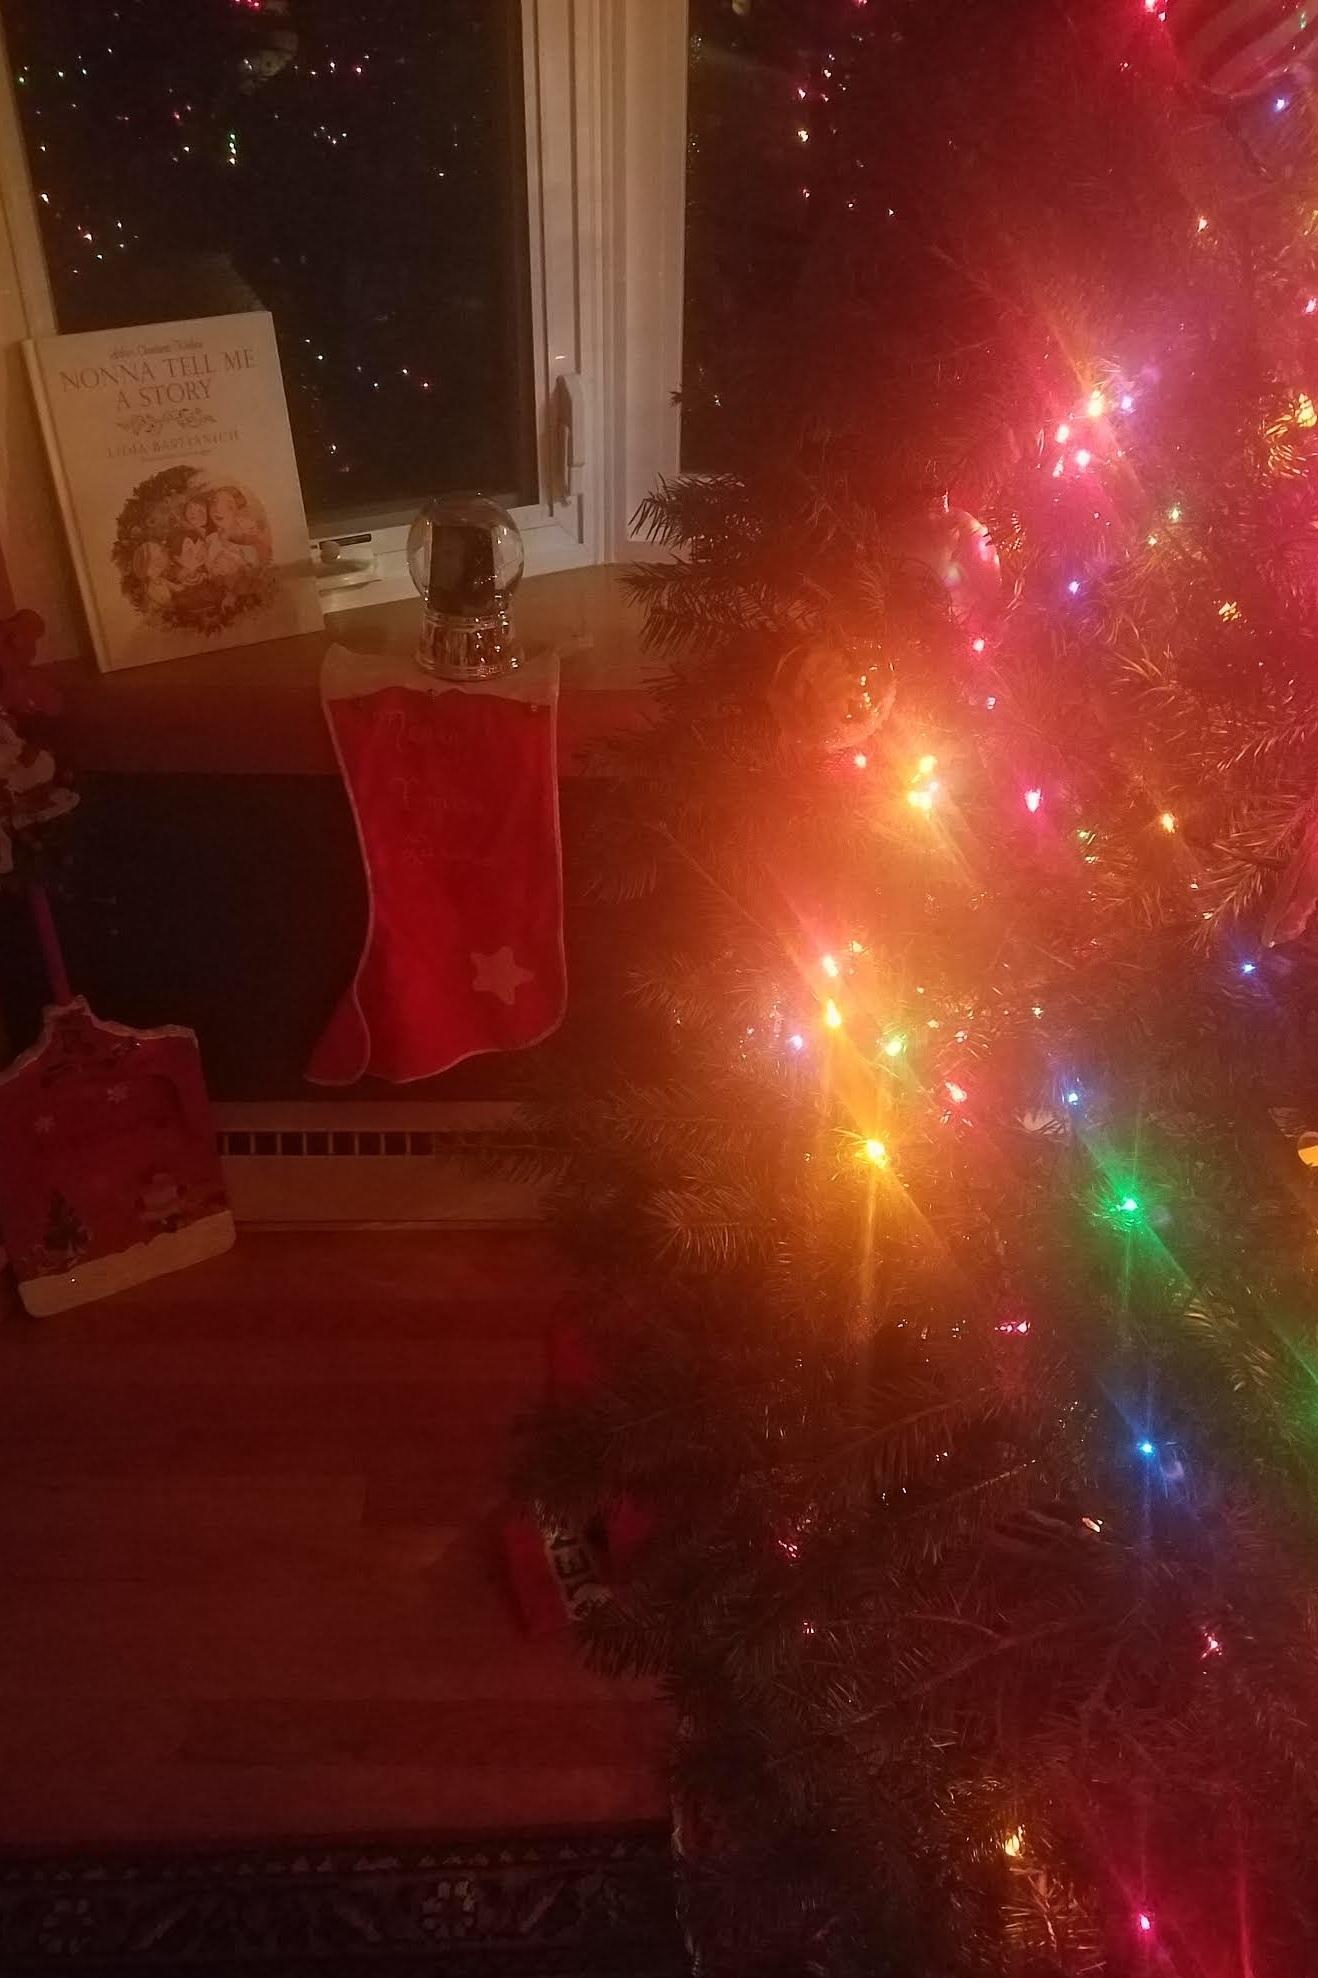 The stocking I had since I was born.